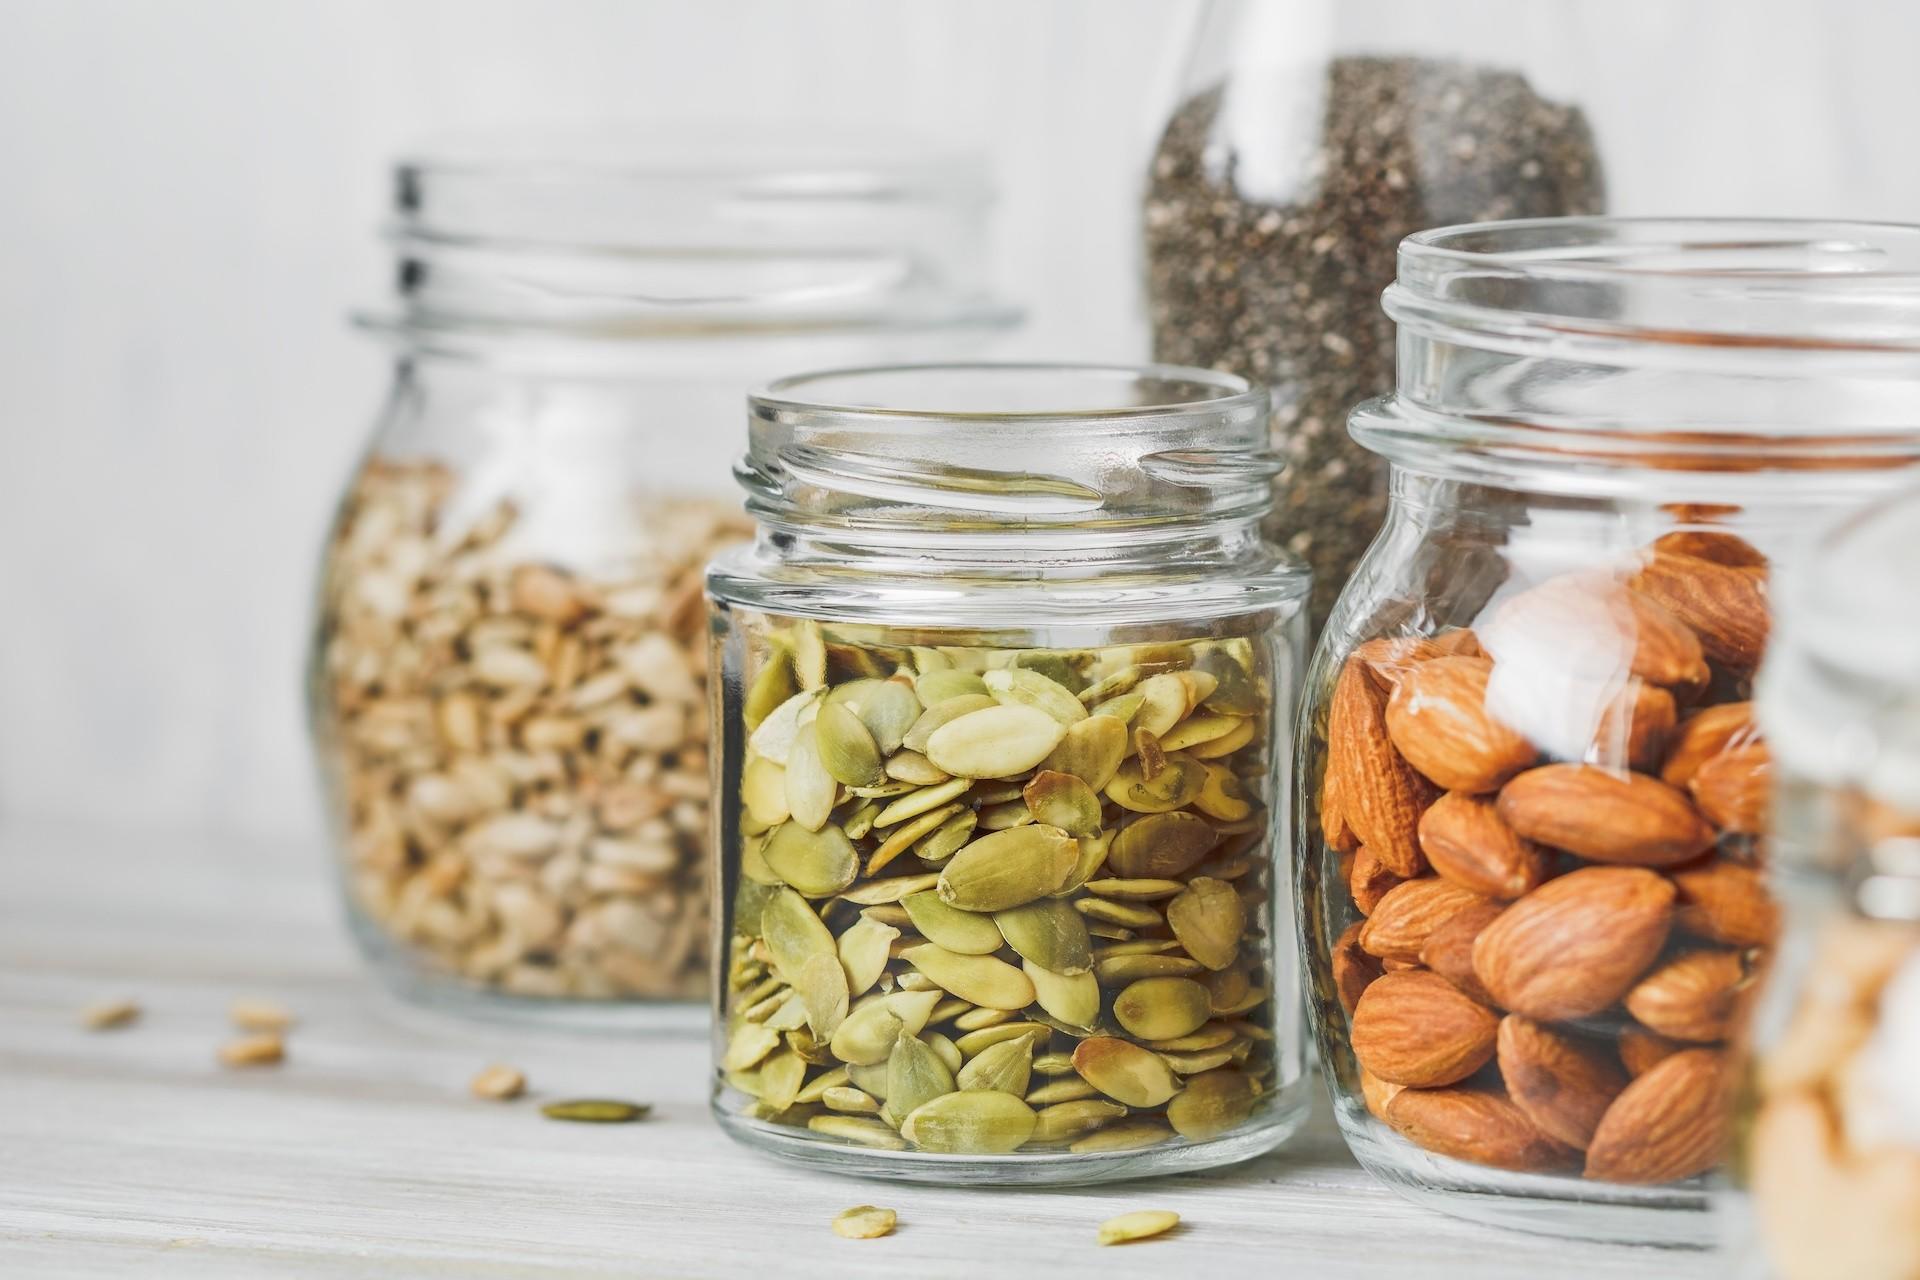 Clear glass jars of vegan snacks: almonds, pumpkin seeds, sunflower seeds